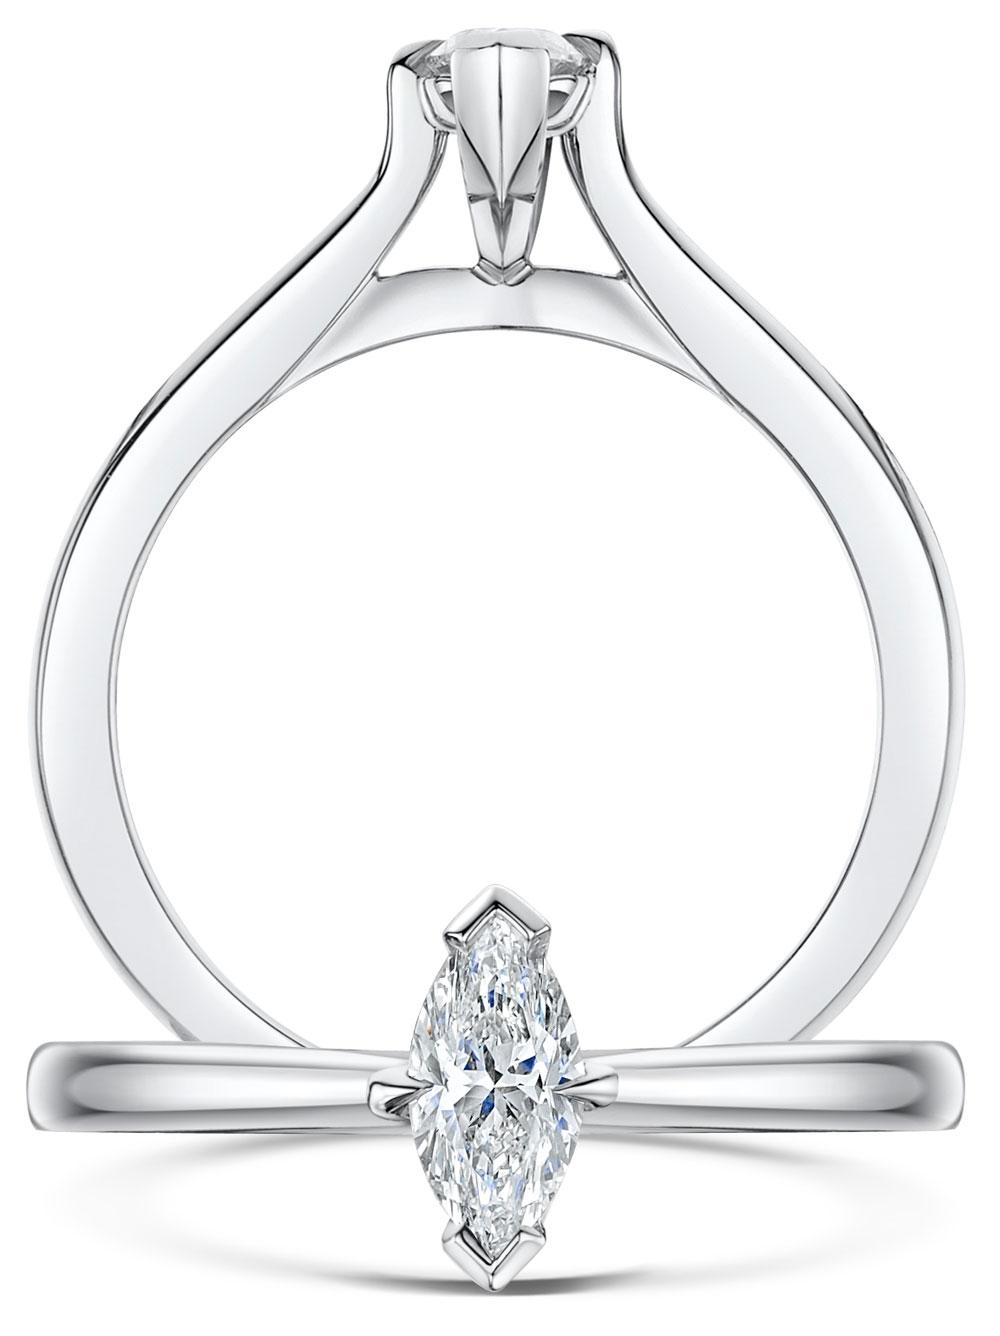 Honour Marquise Cut Diamond Ring